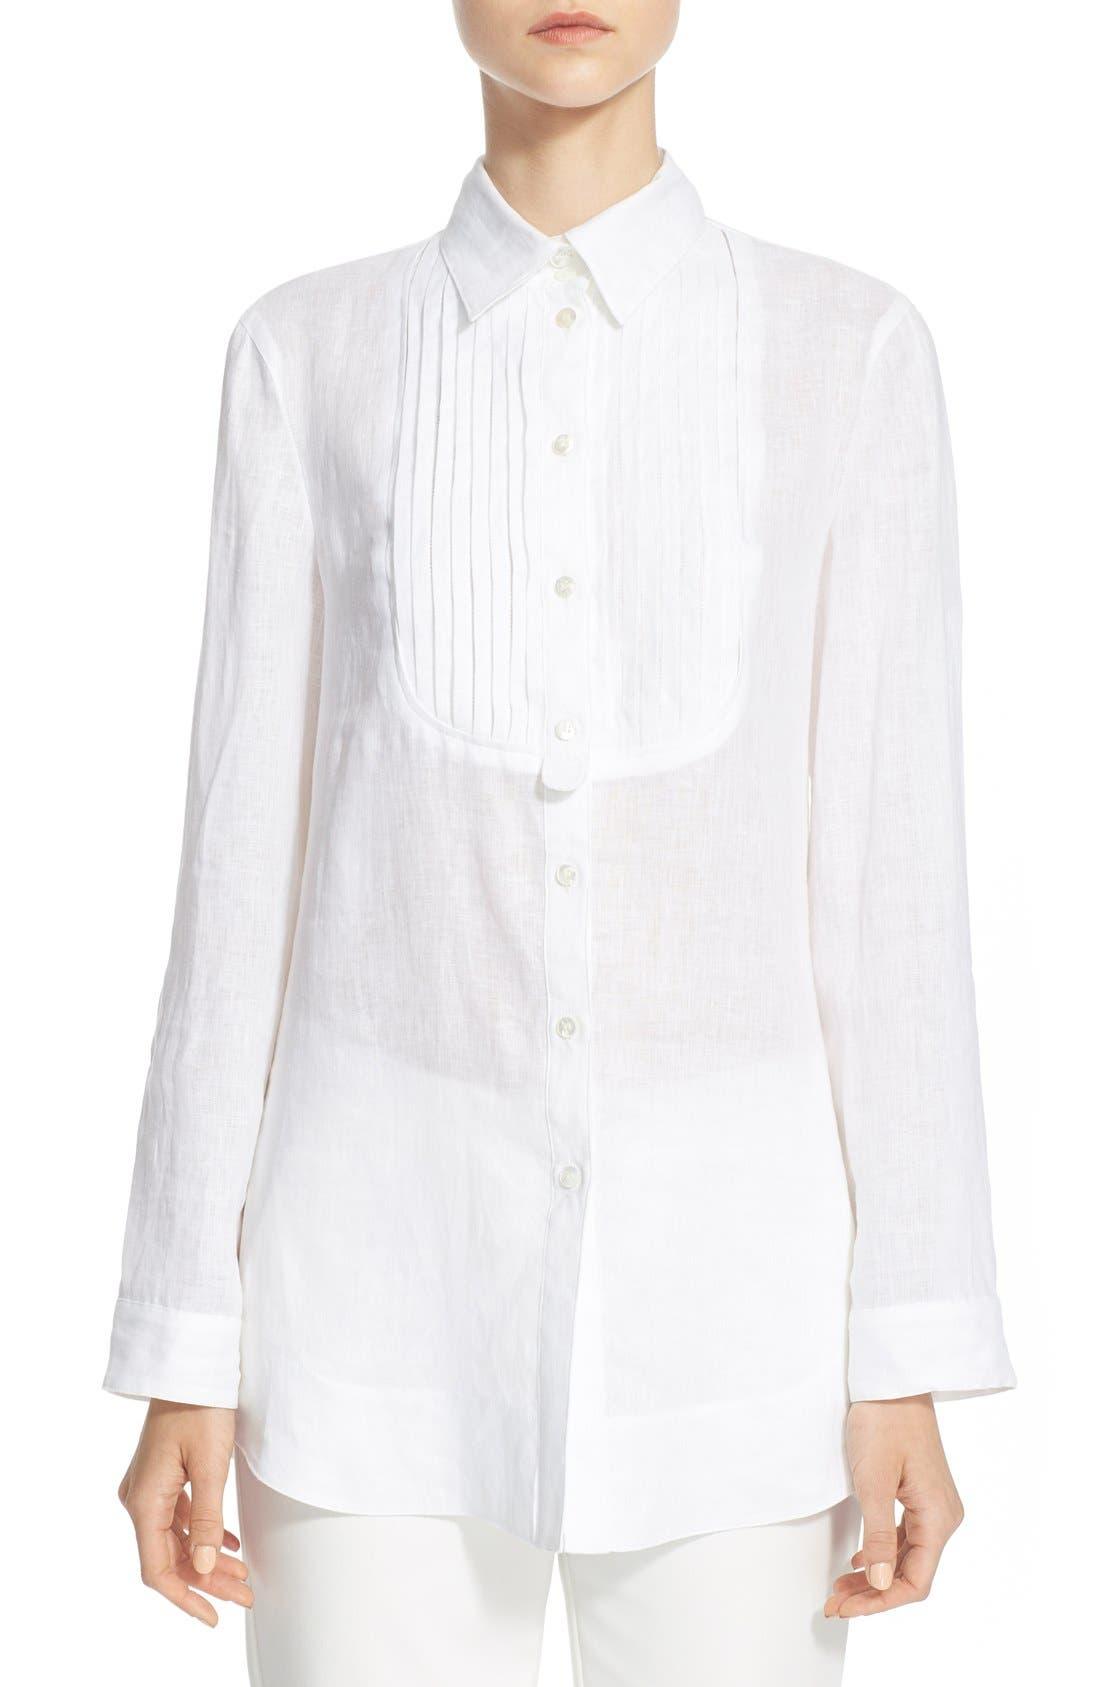 ARMANI COLLEZIONI,                             Linen Tuxedo Shirt,                             Main thumbnail 1, color,                             100